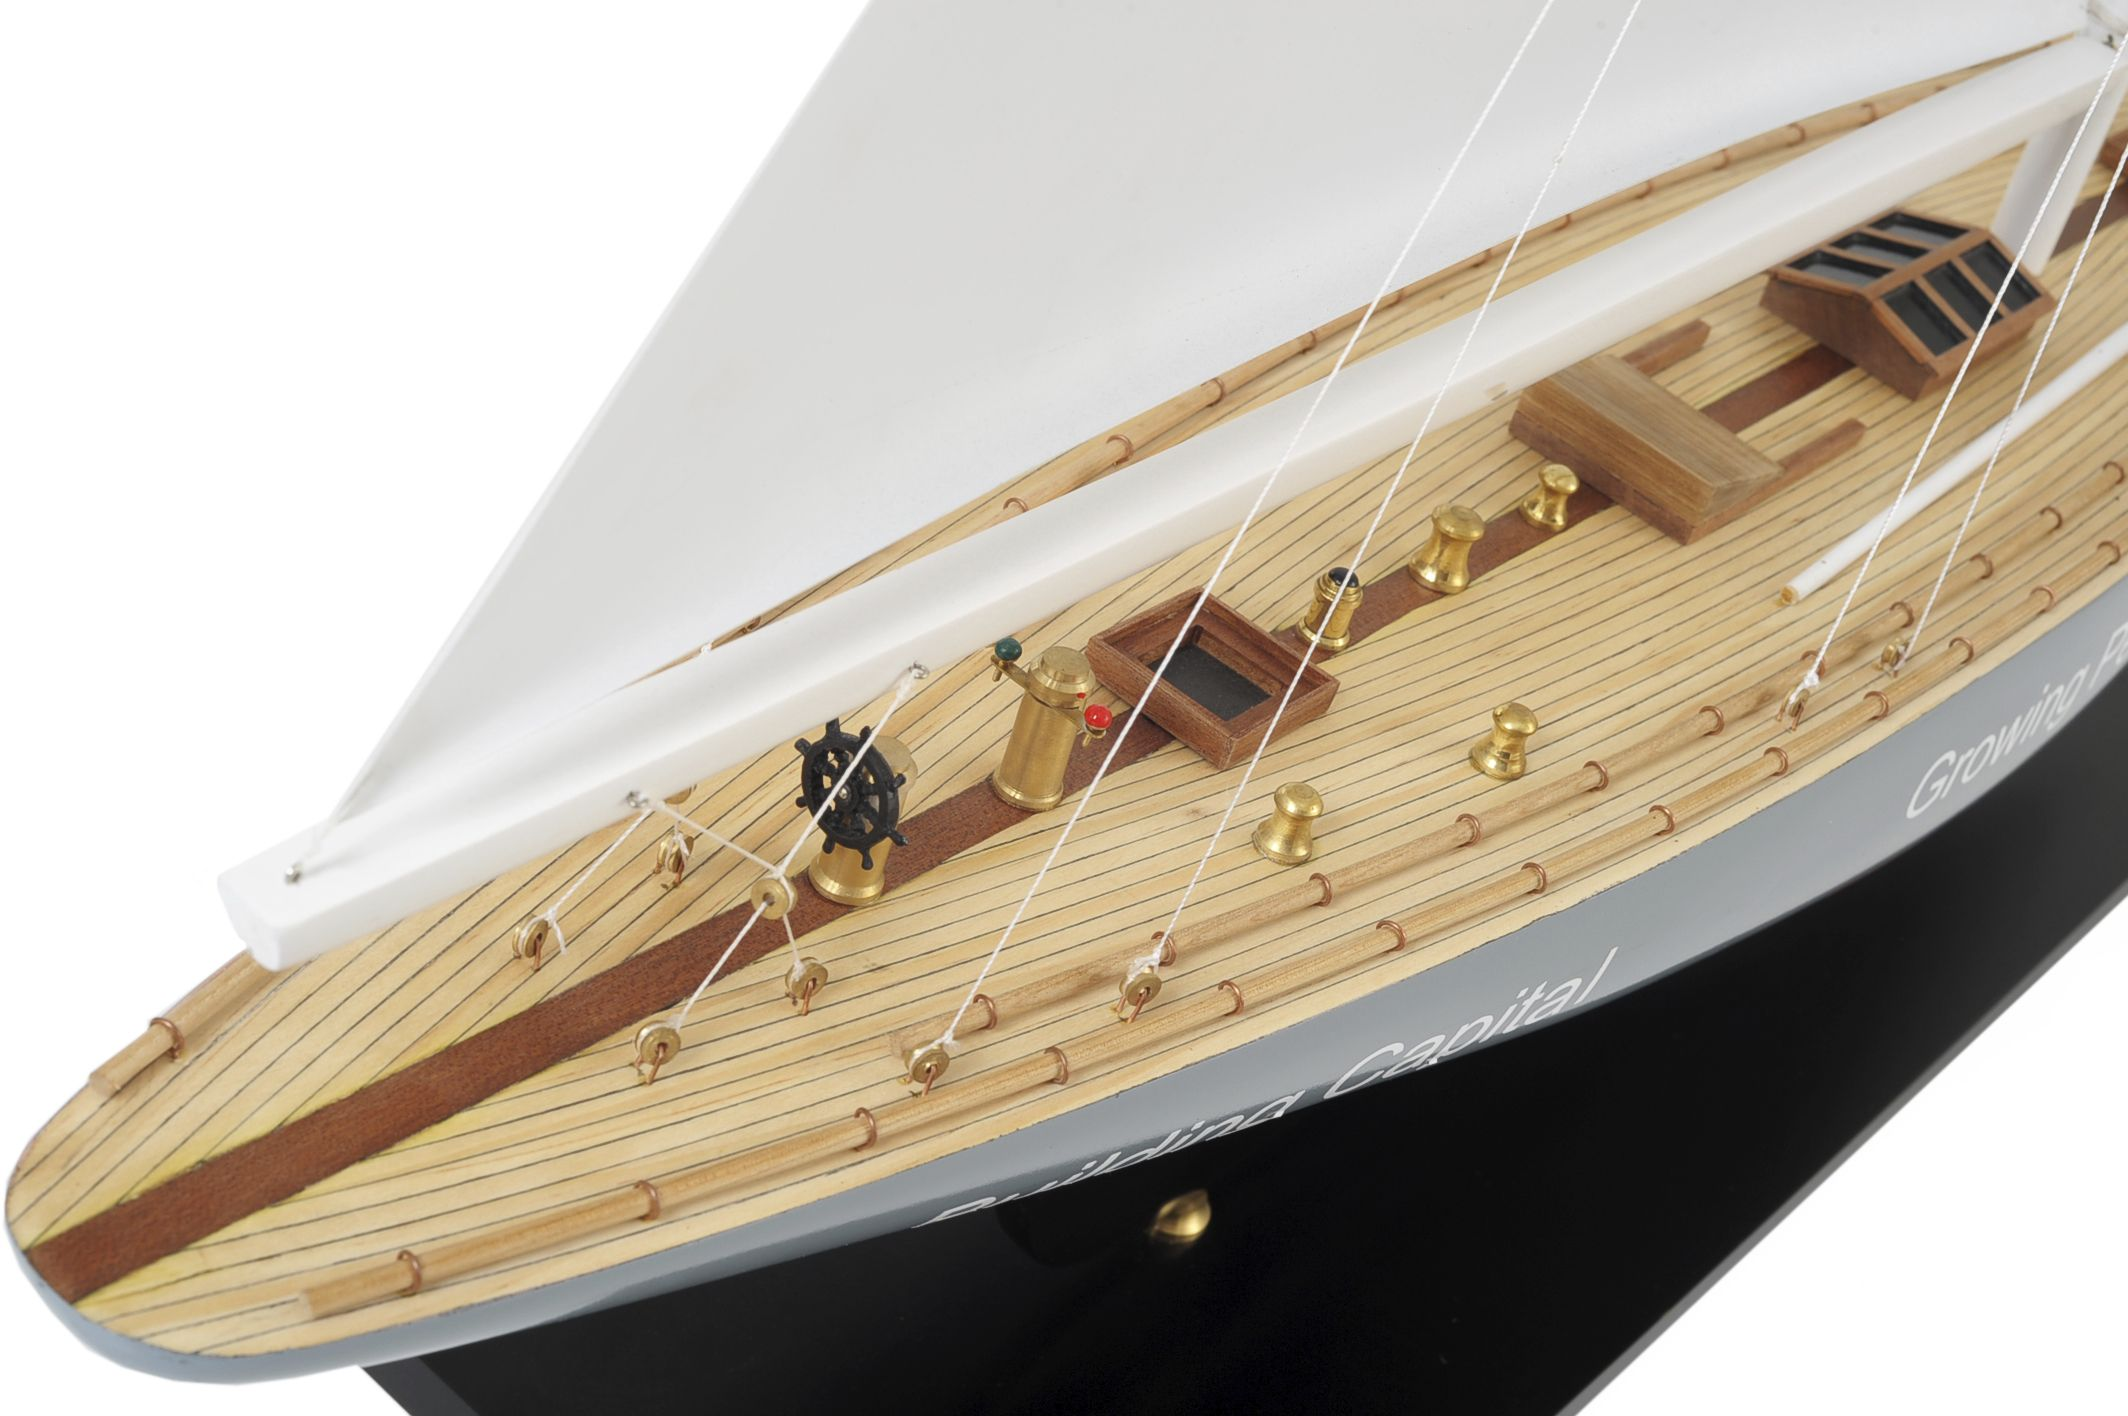 1519-8978-Enterprise-Model-Yacht